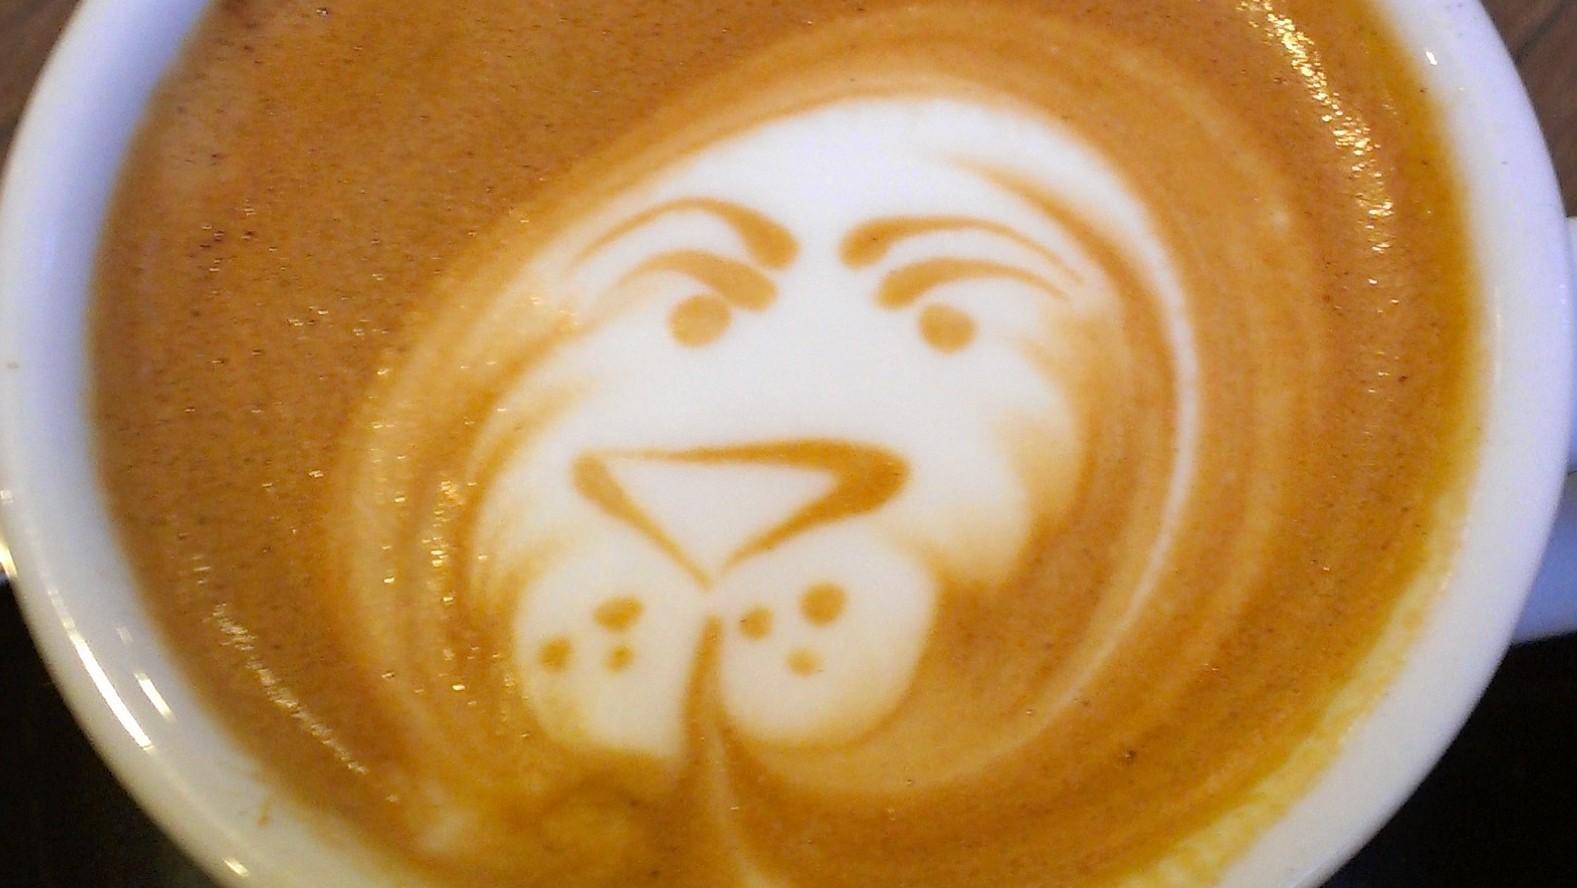 Latte art of lion